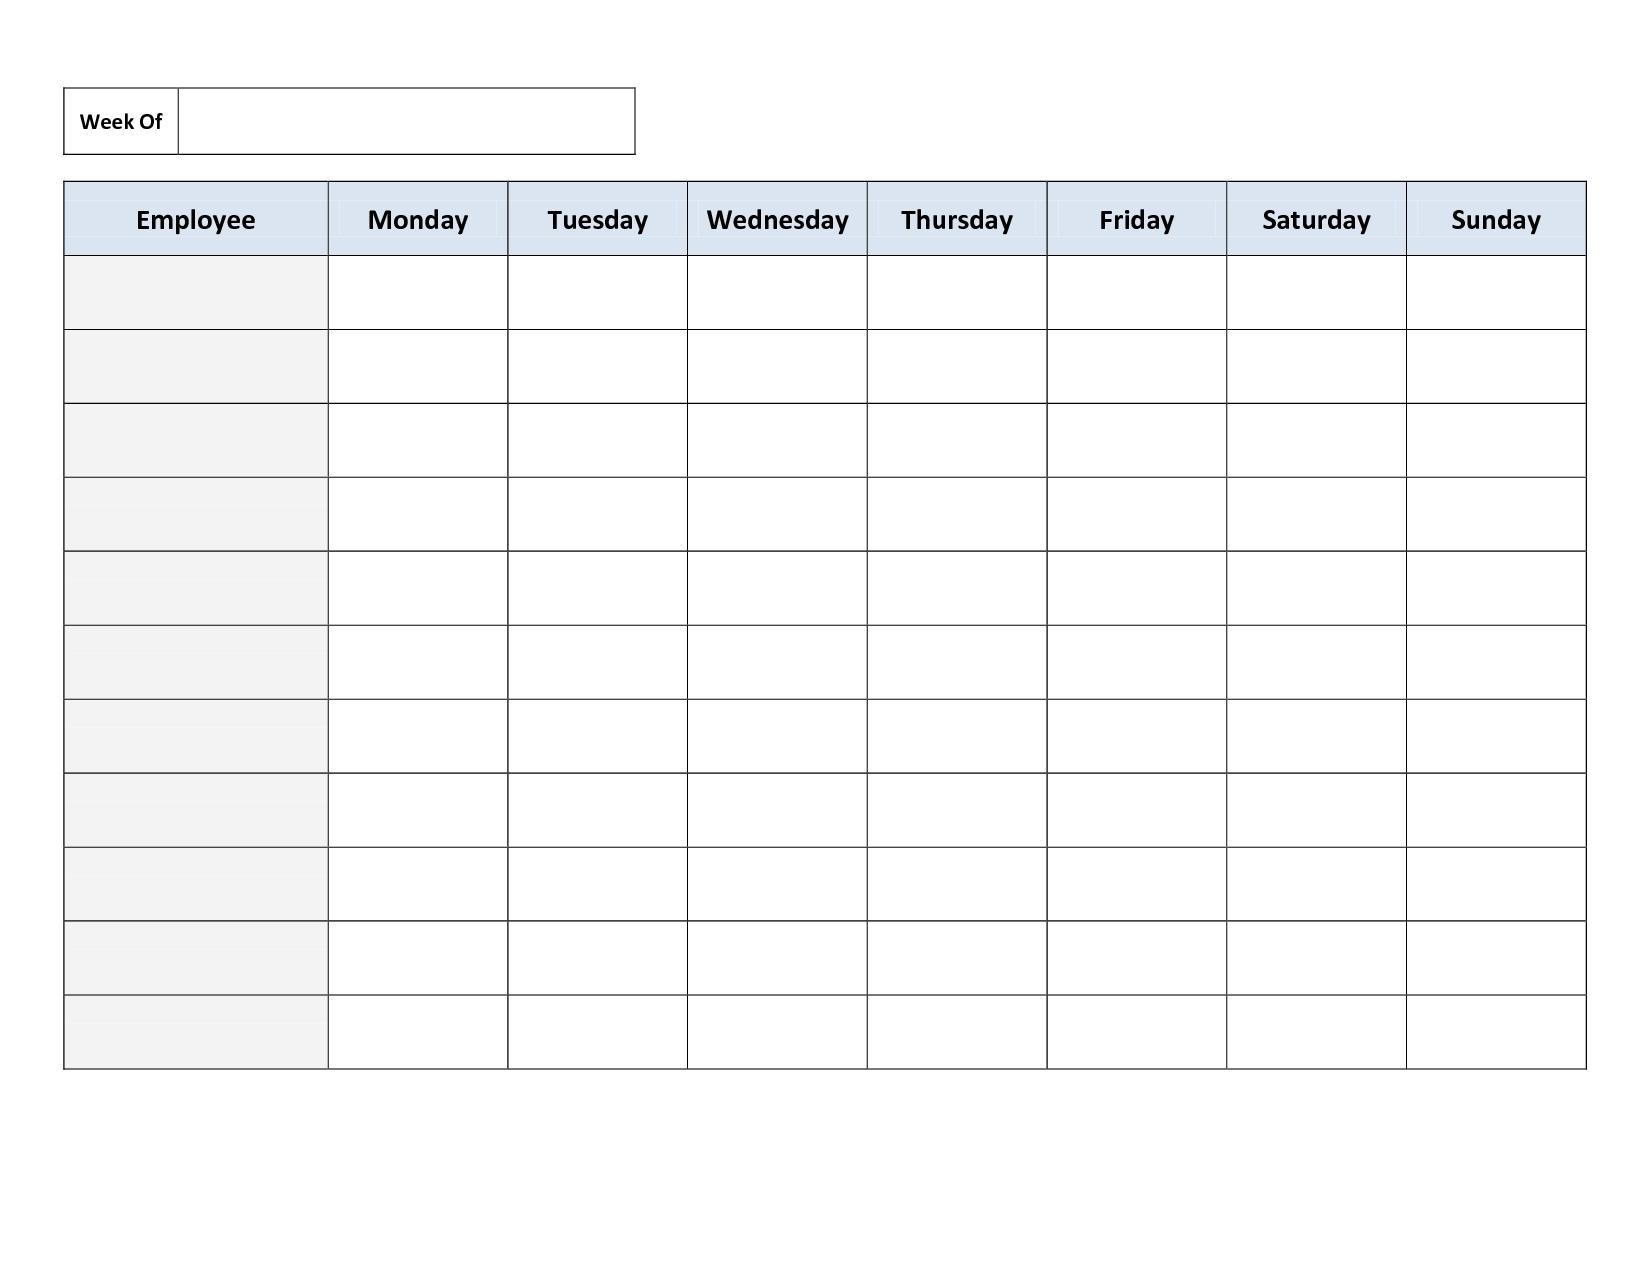 Weekly Employee Work Schedule Template. Free Blank Schedule-Shift Planner Templates Printable